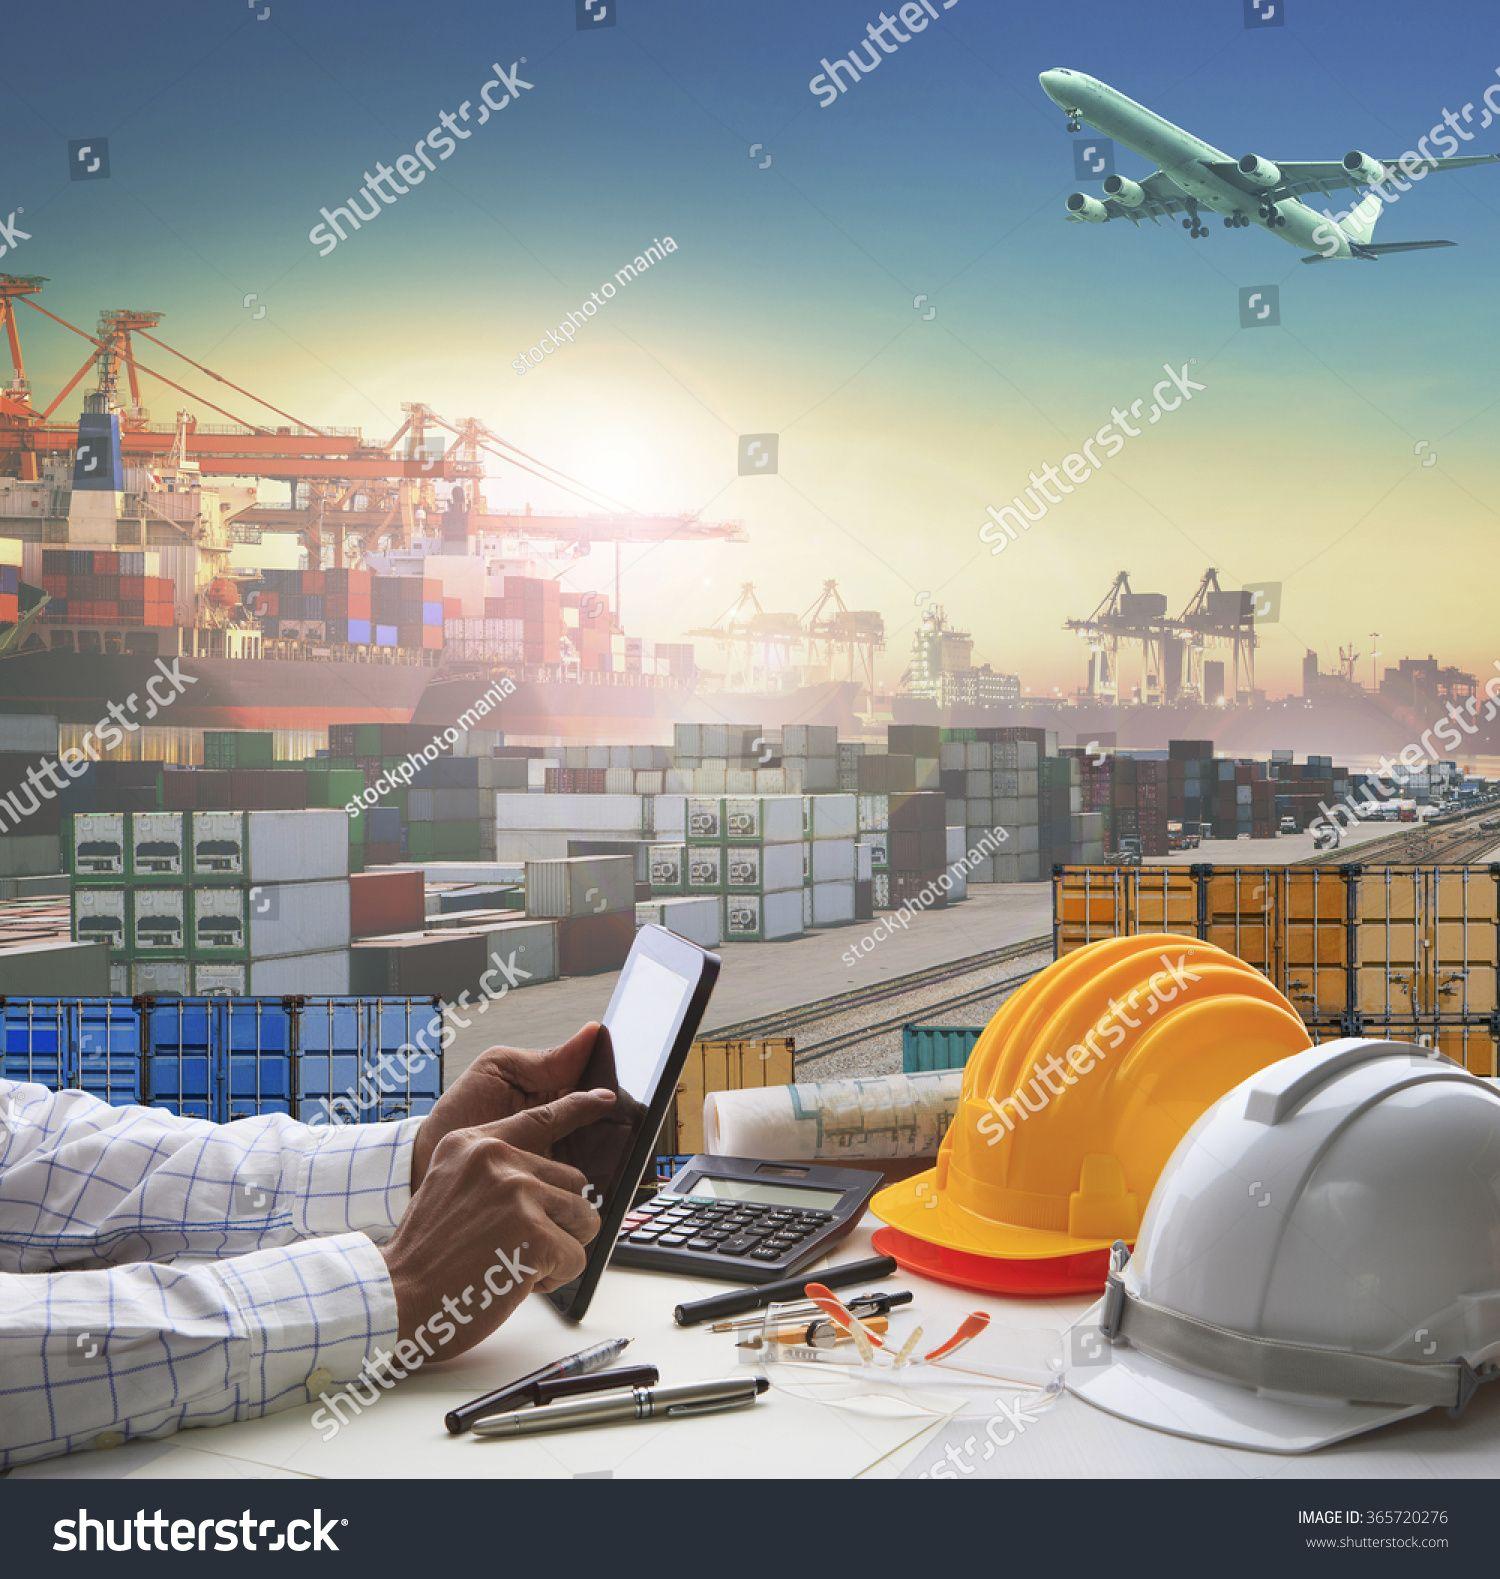 set up import export business uk